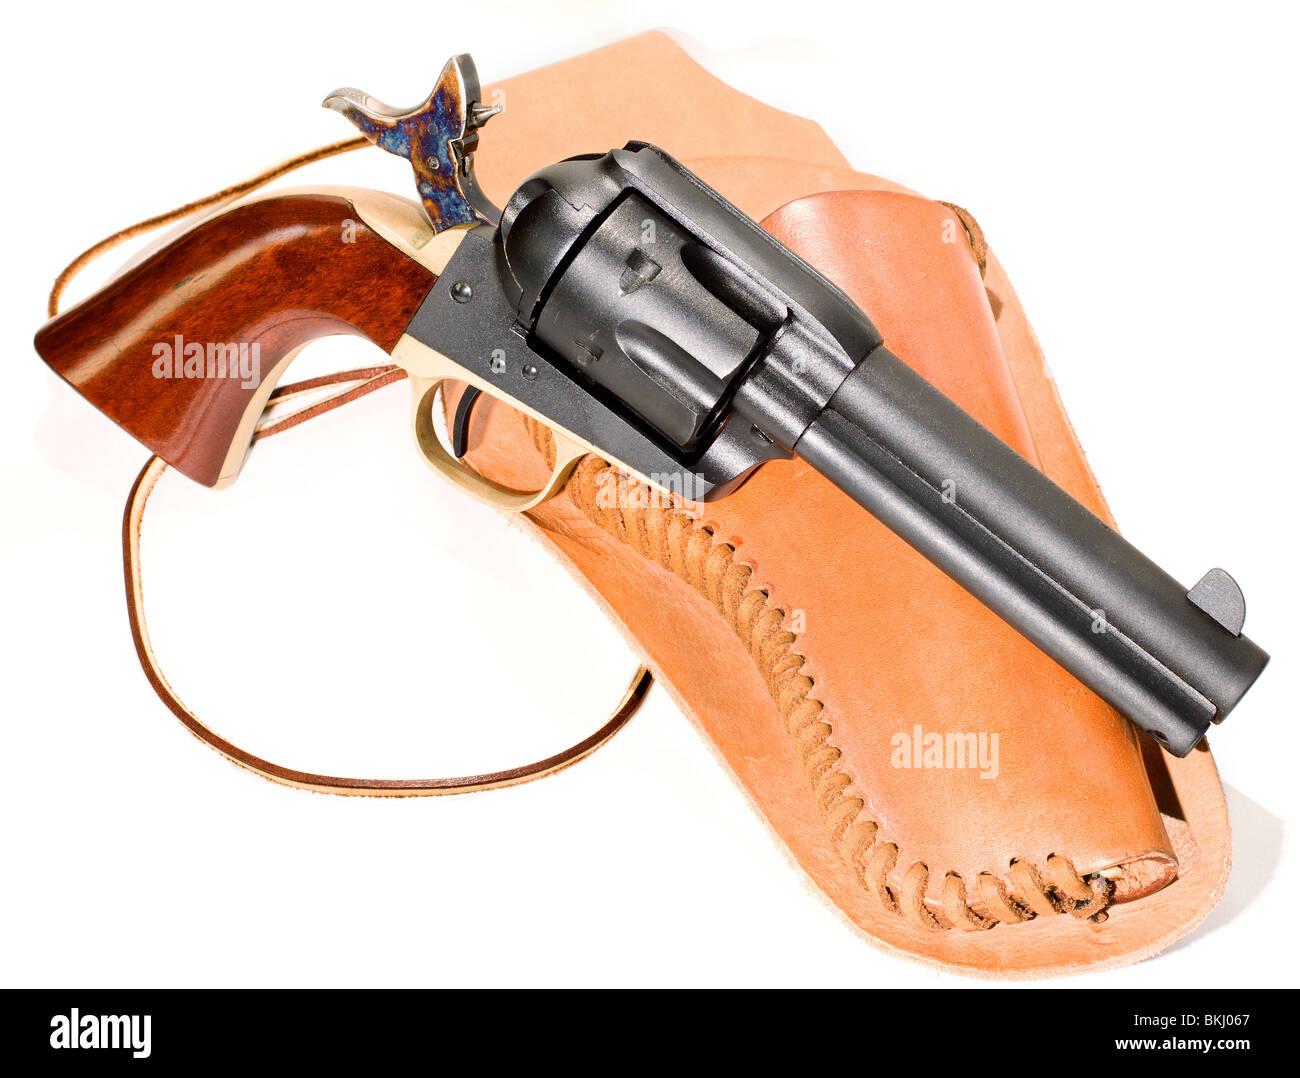 Revolver Colt Pistol Imágenes De Stock & Revolver Colt Pistol Fotos ...